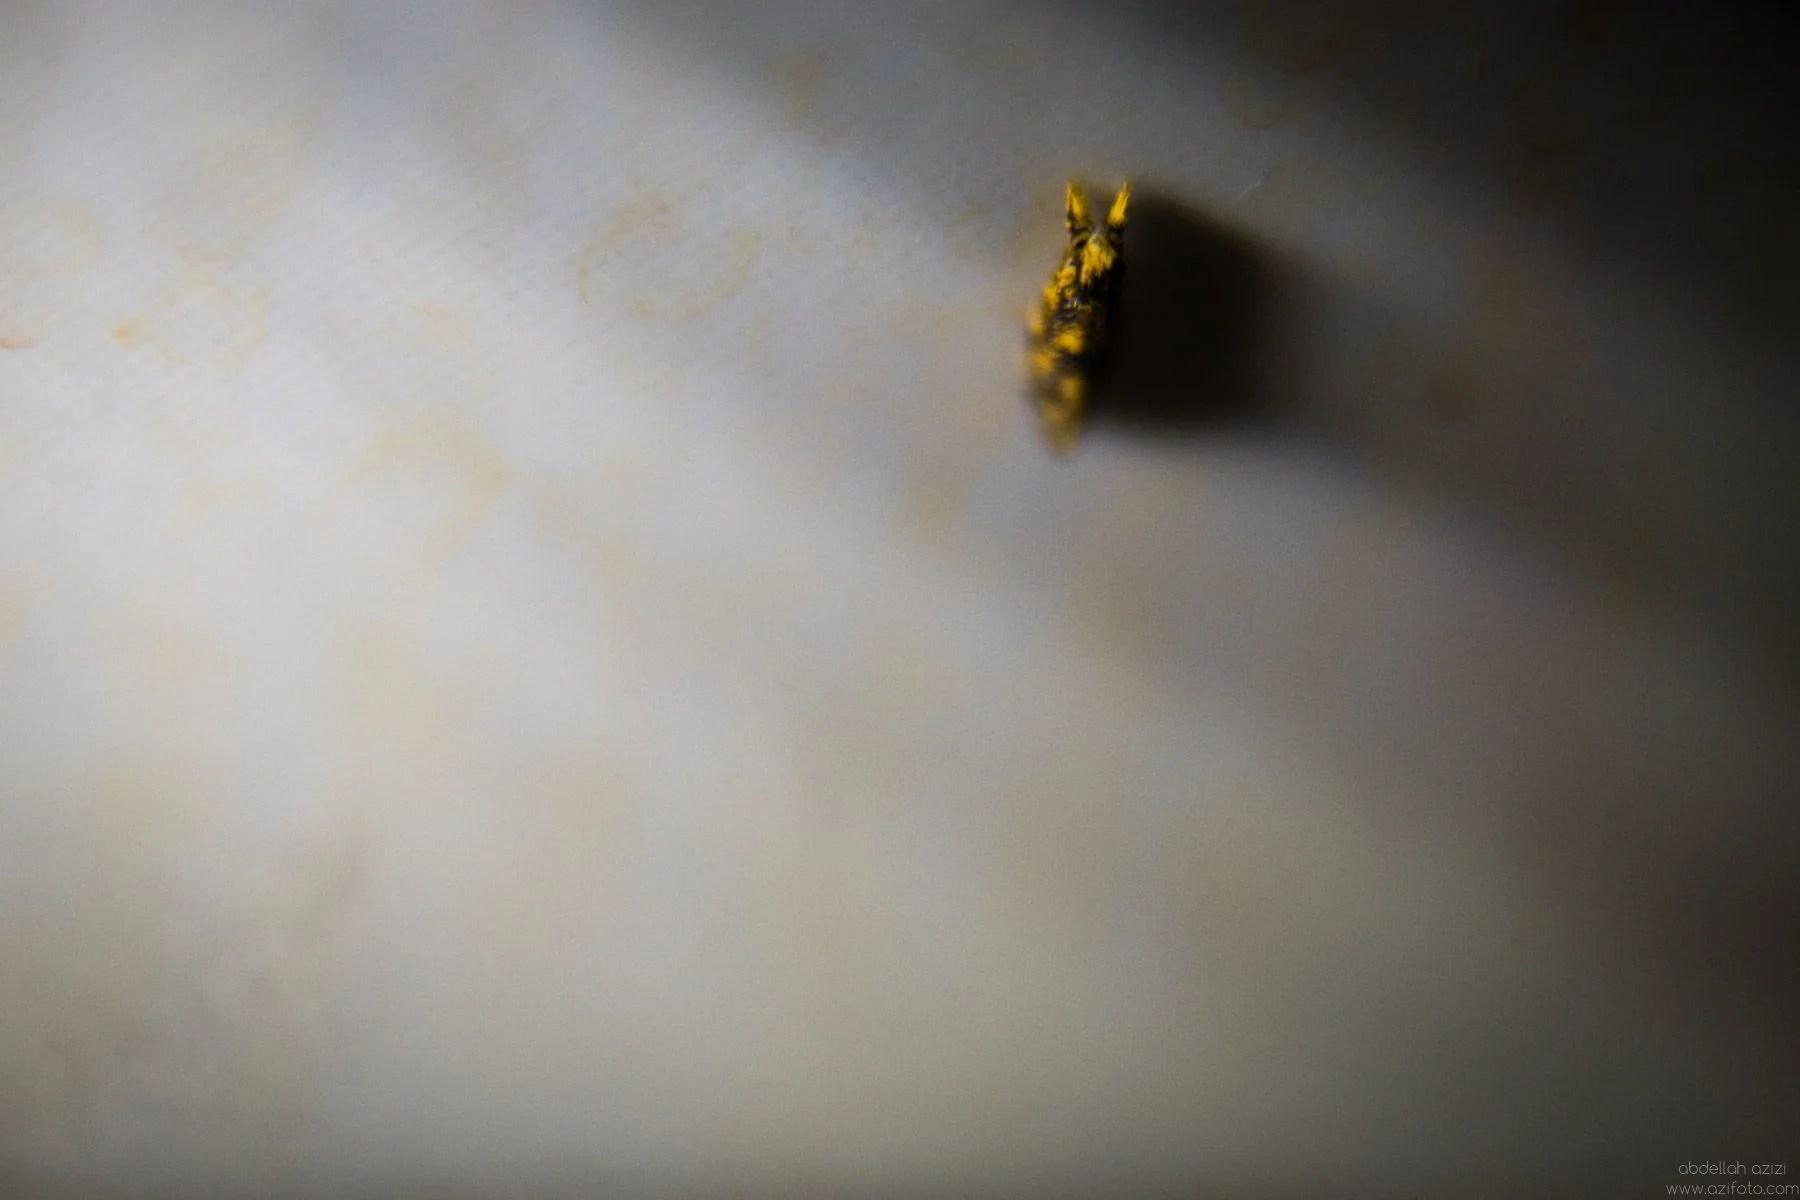 Clos up of qn insect, abdellah azizi photography